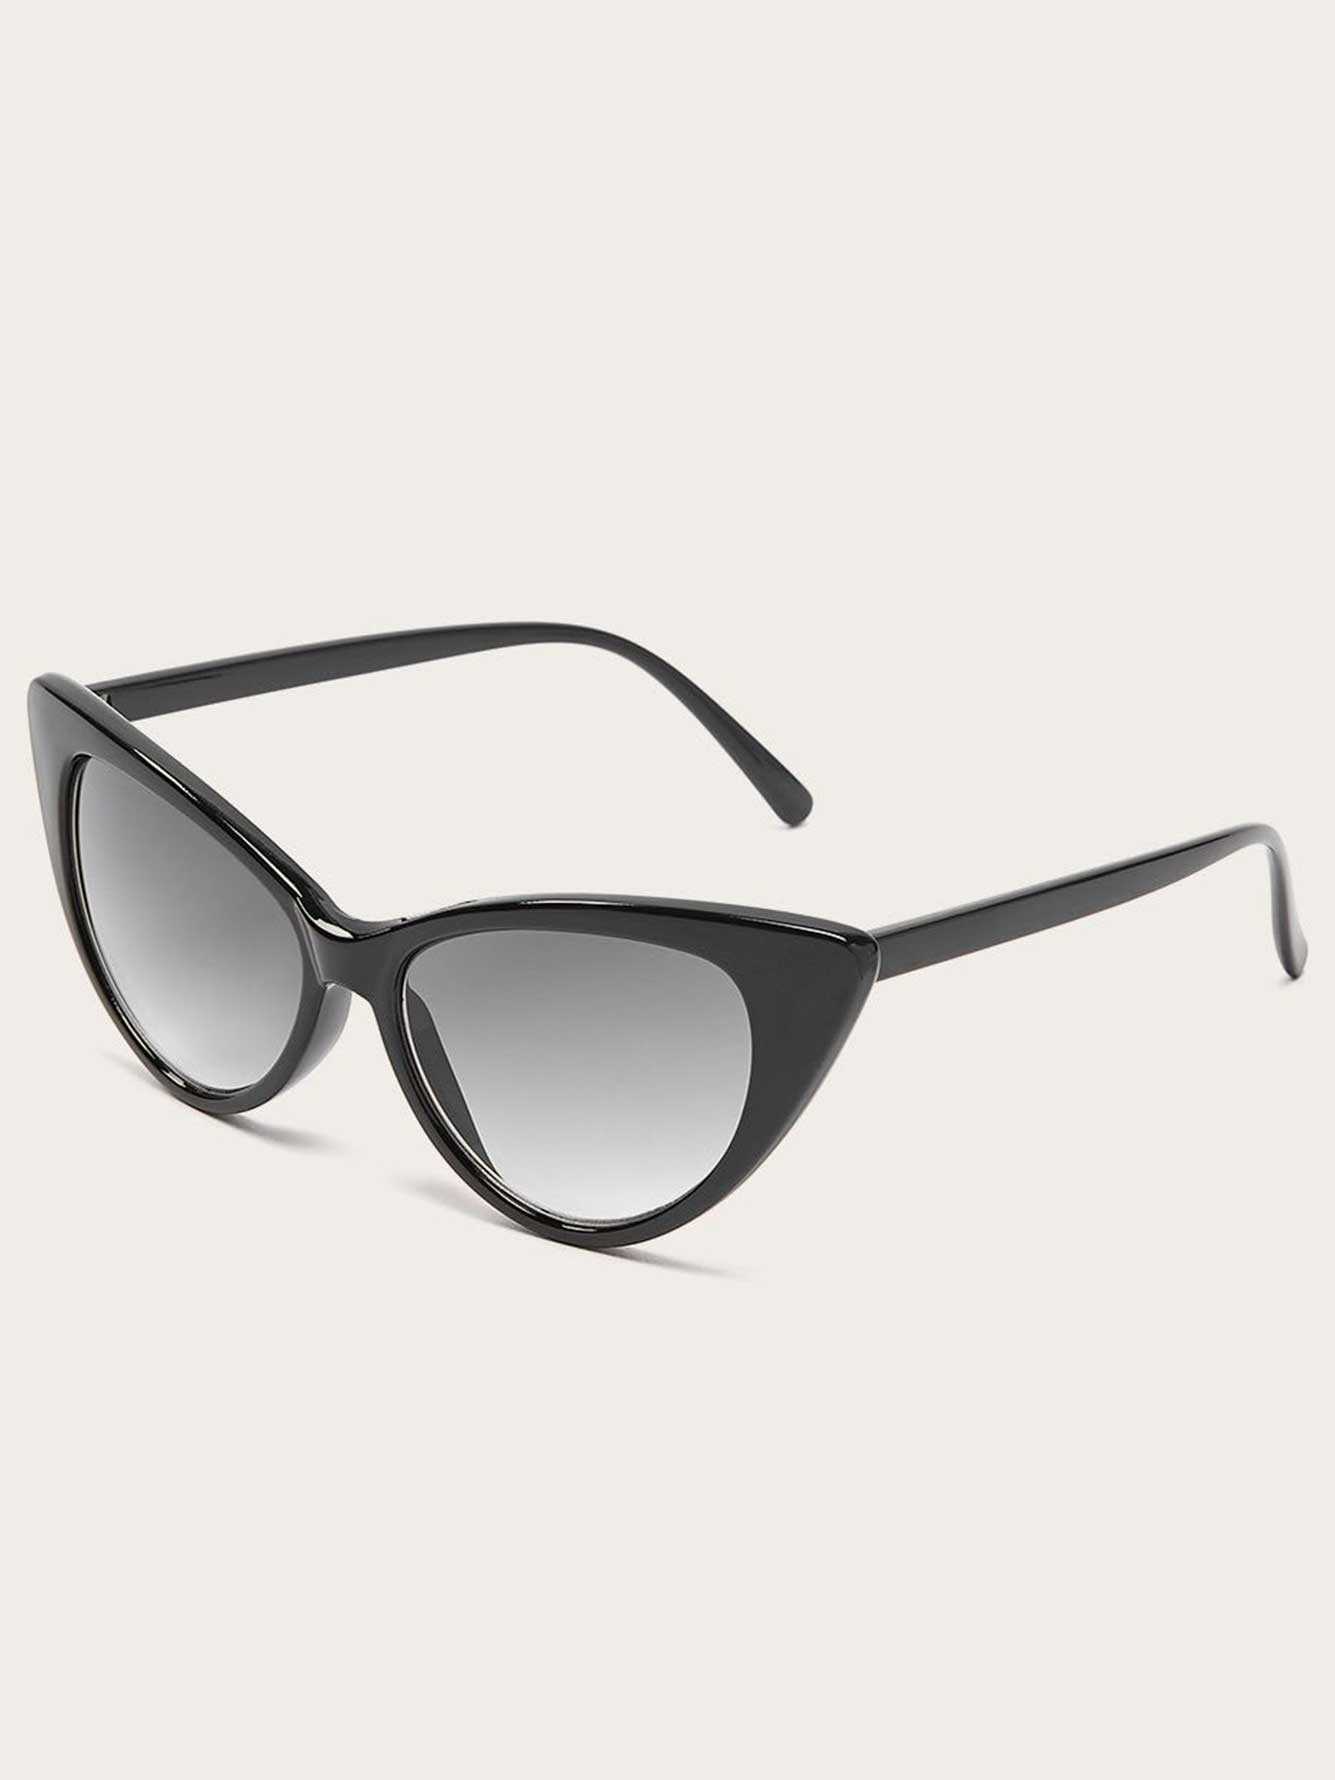 86c07dfc8 Black Cat Eye Sunglasses